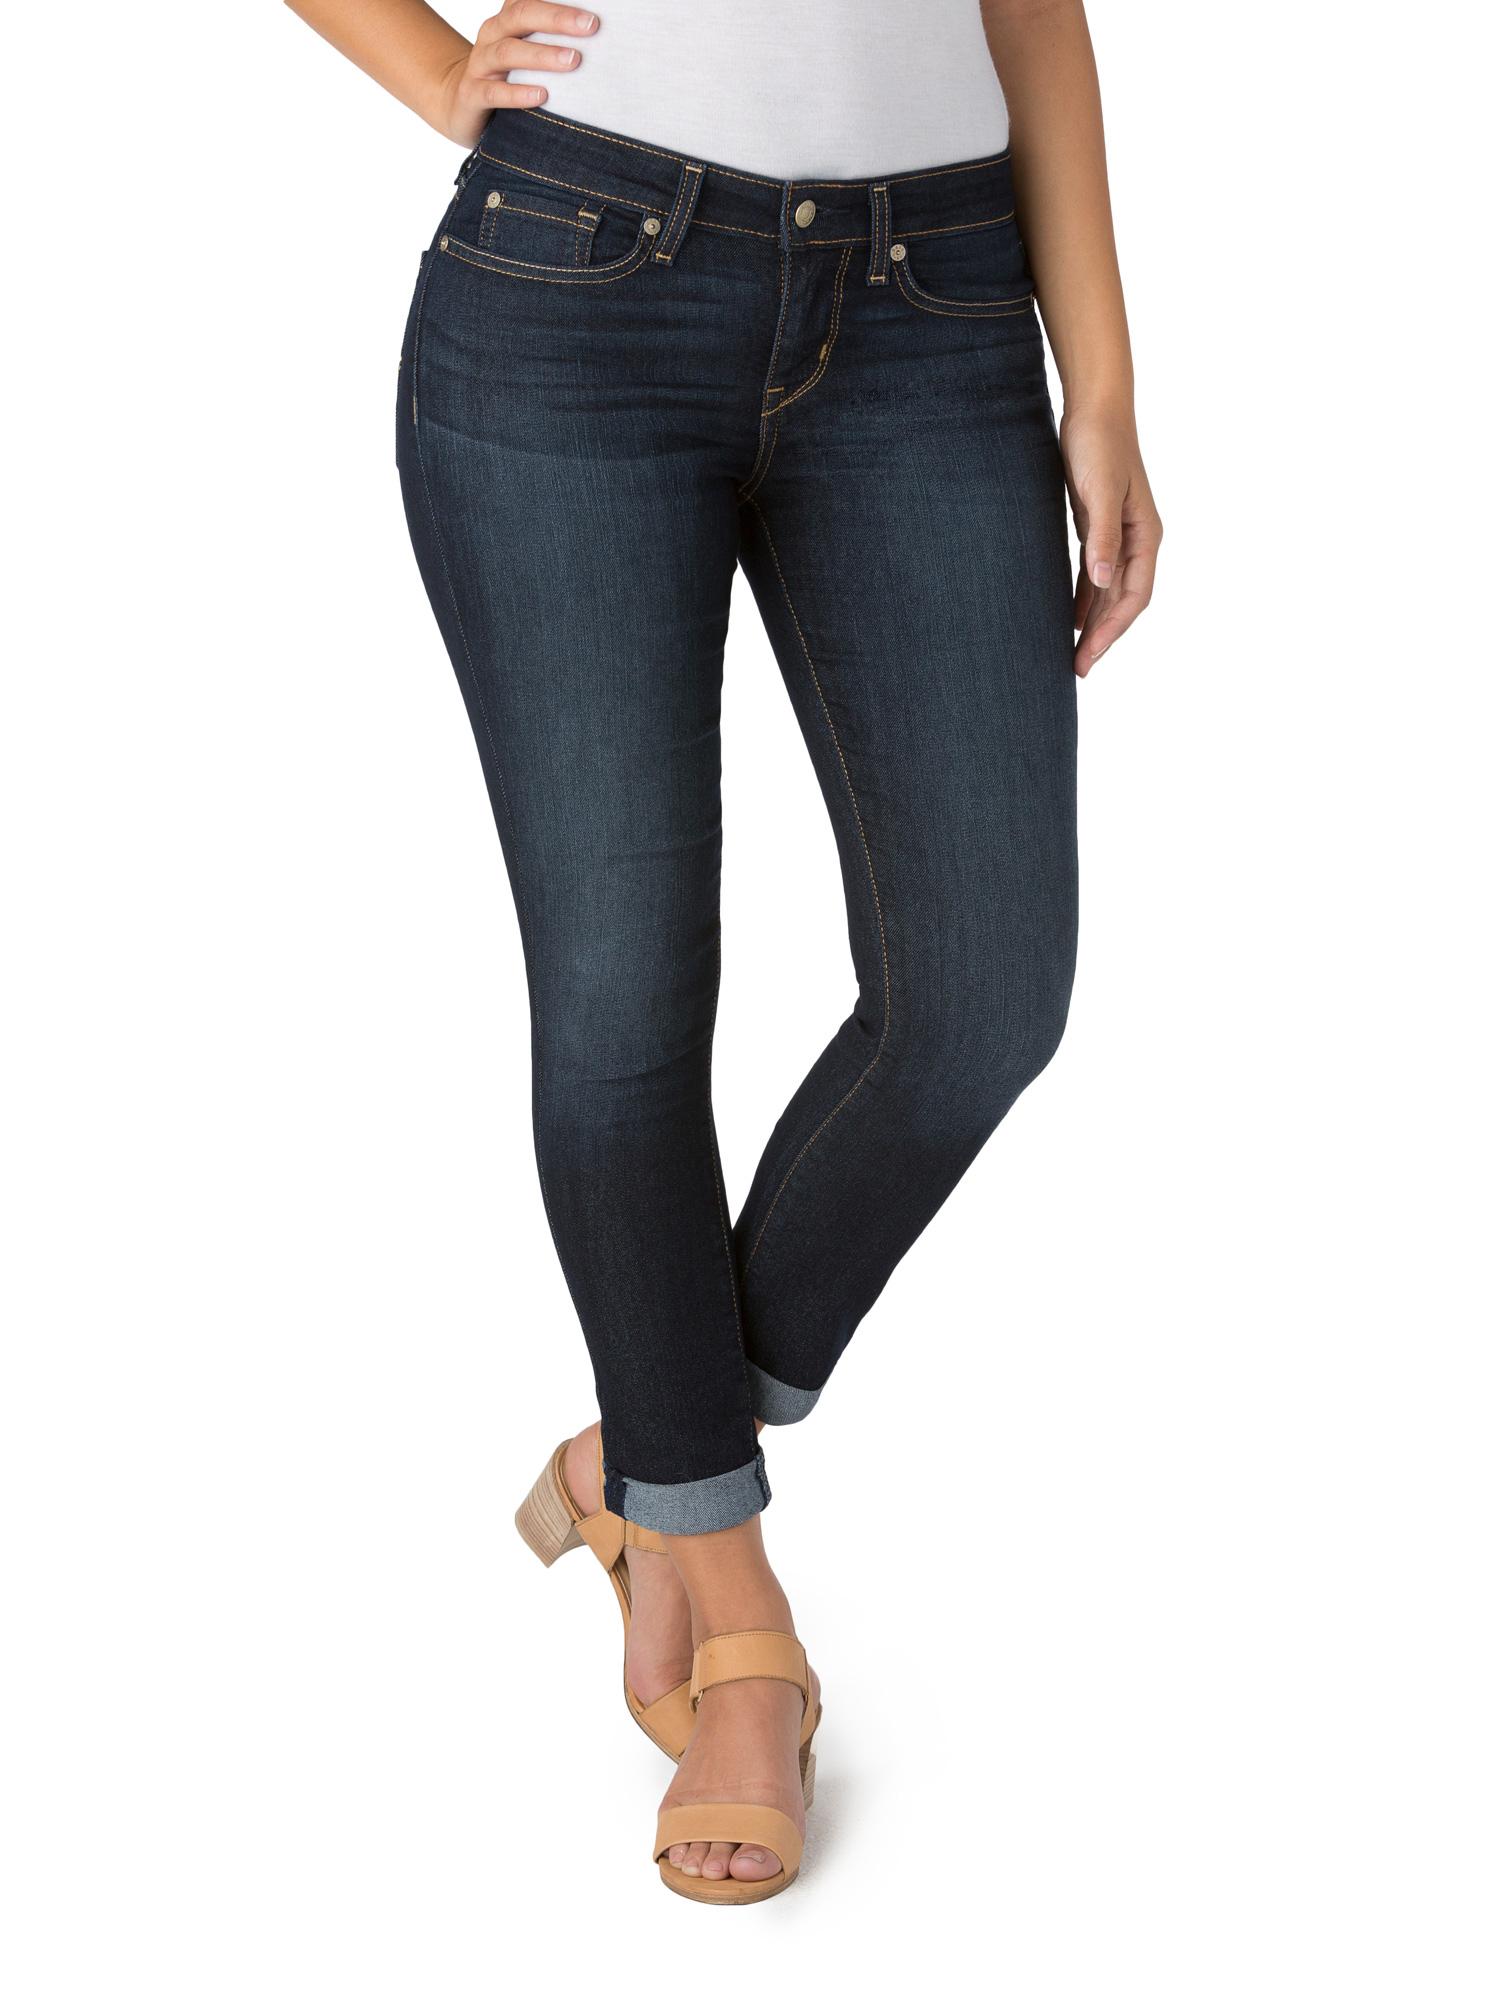 Women's Mid Rise Slim Cuffed Jeans